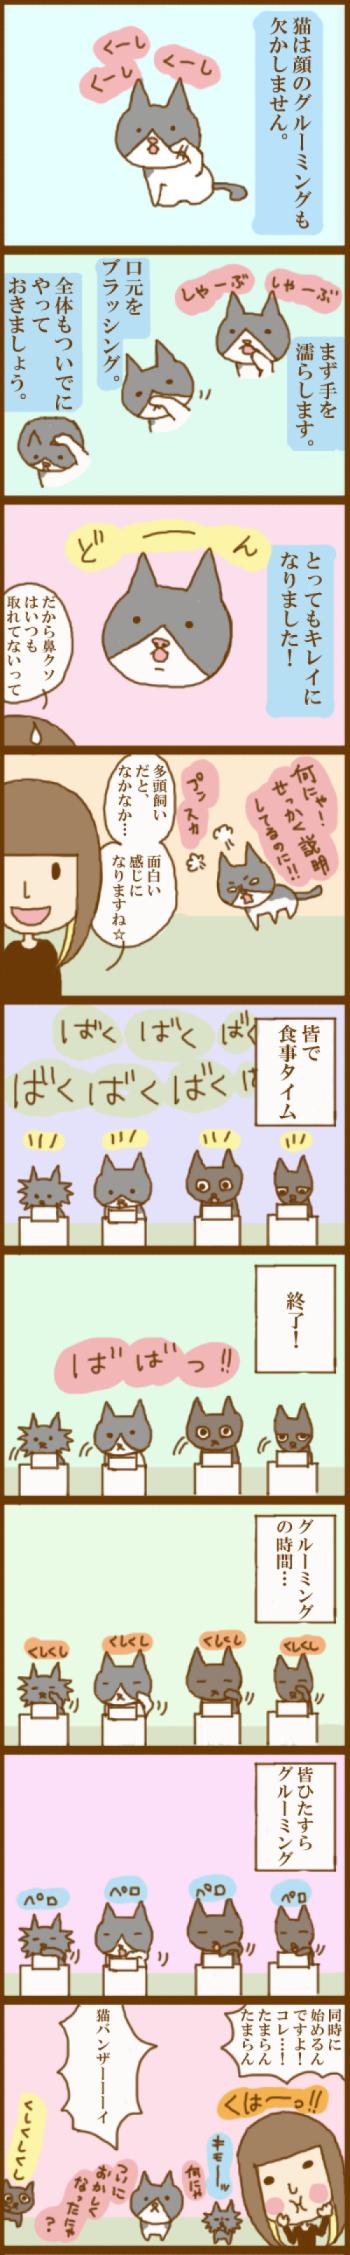 f:id:suzuokayu:20201115190447j:plain